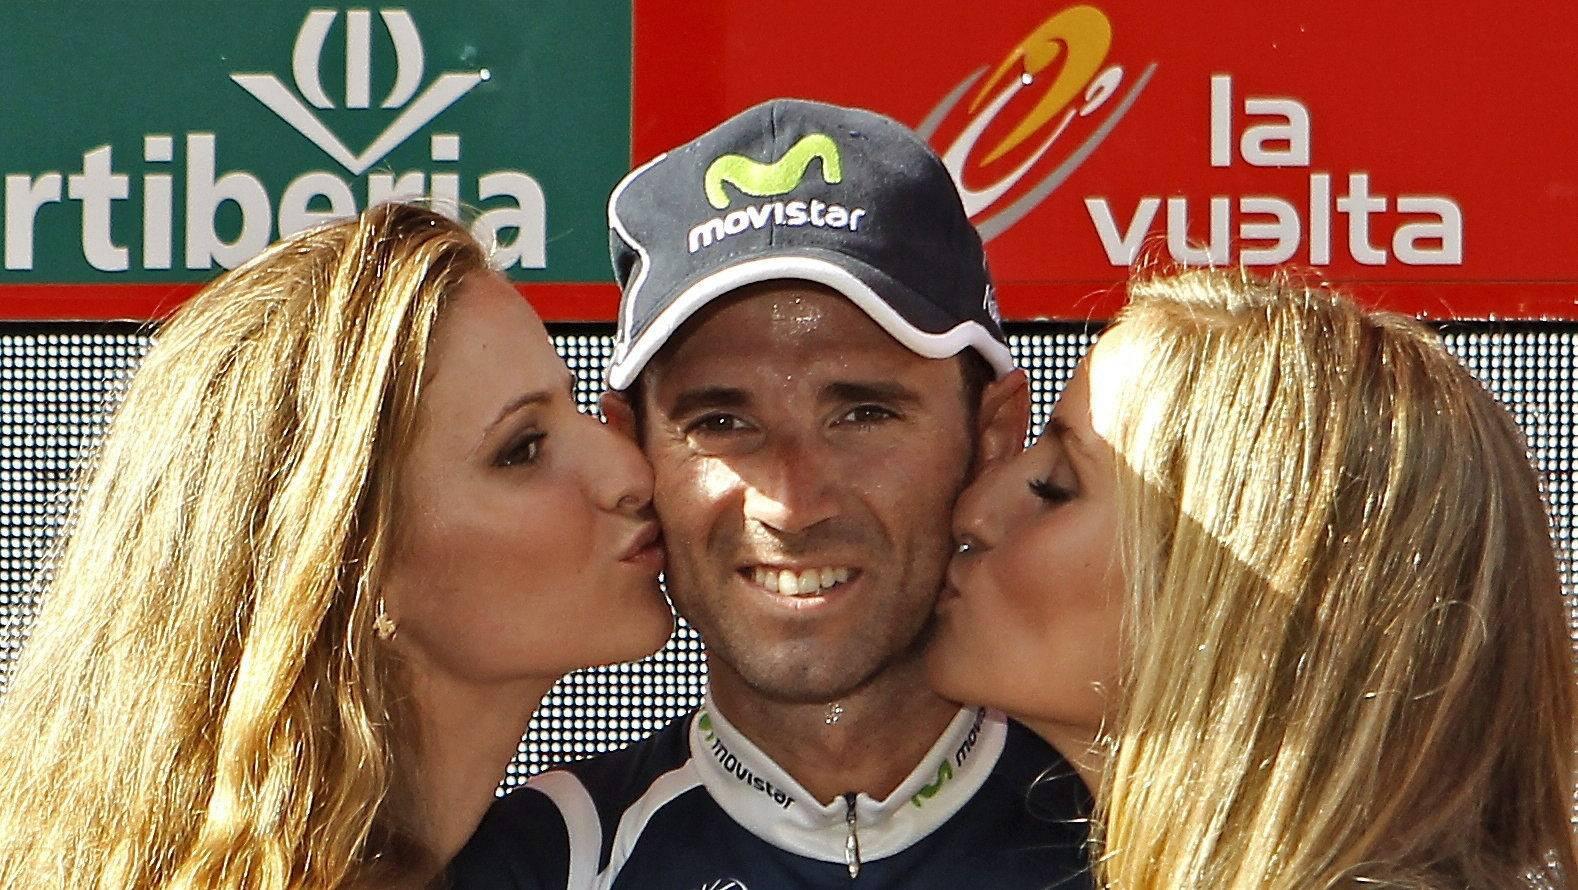 Las imagenes que nos deja la tercera etapa de la Vuelta